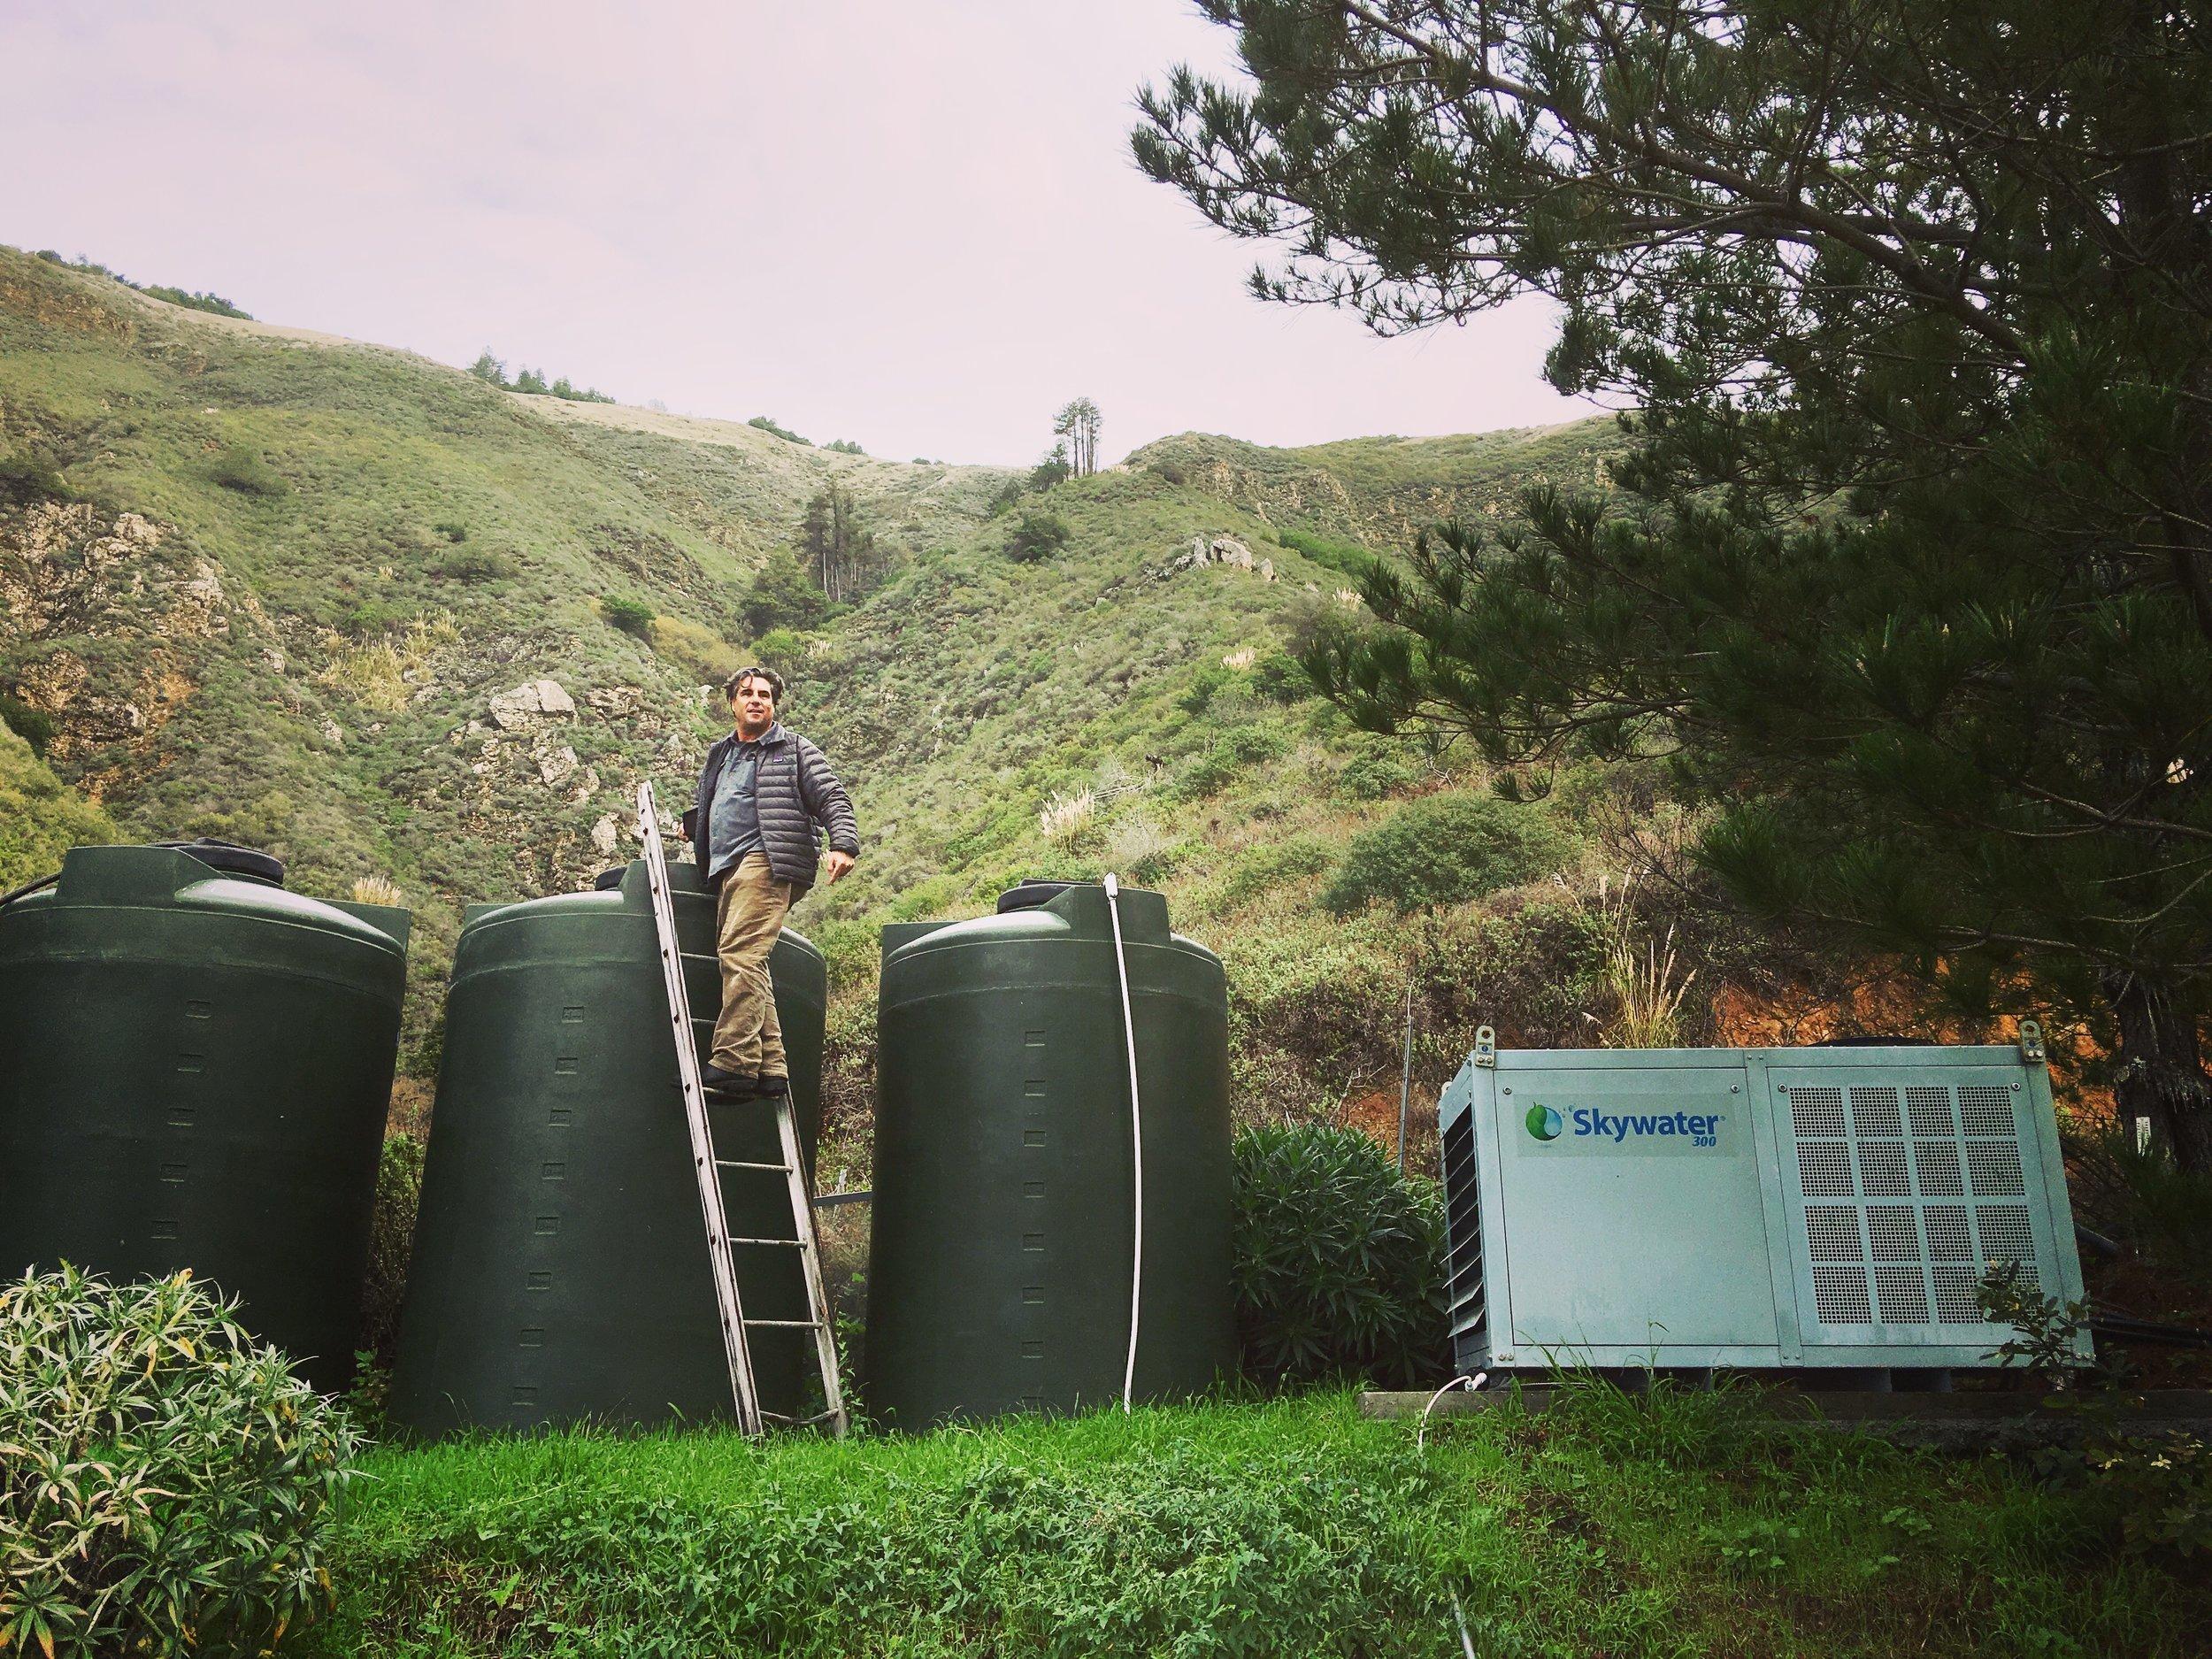 myCleantechFreshWater™ - Fresh water from air - Trinkwasser aus der Luft ab... K20181109-04 - Let's developp your renewable project togheter